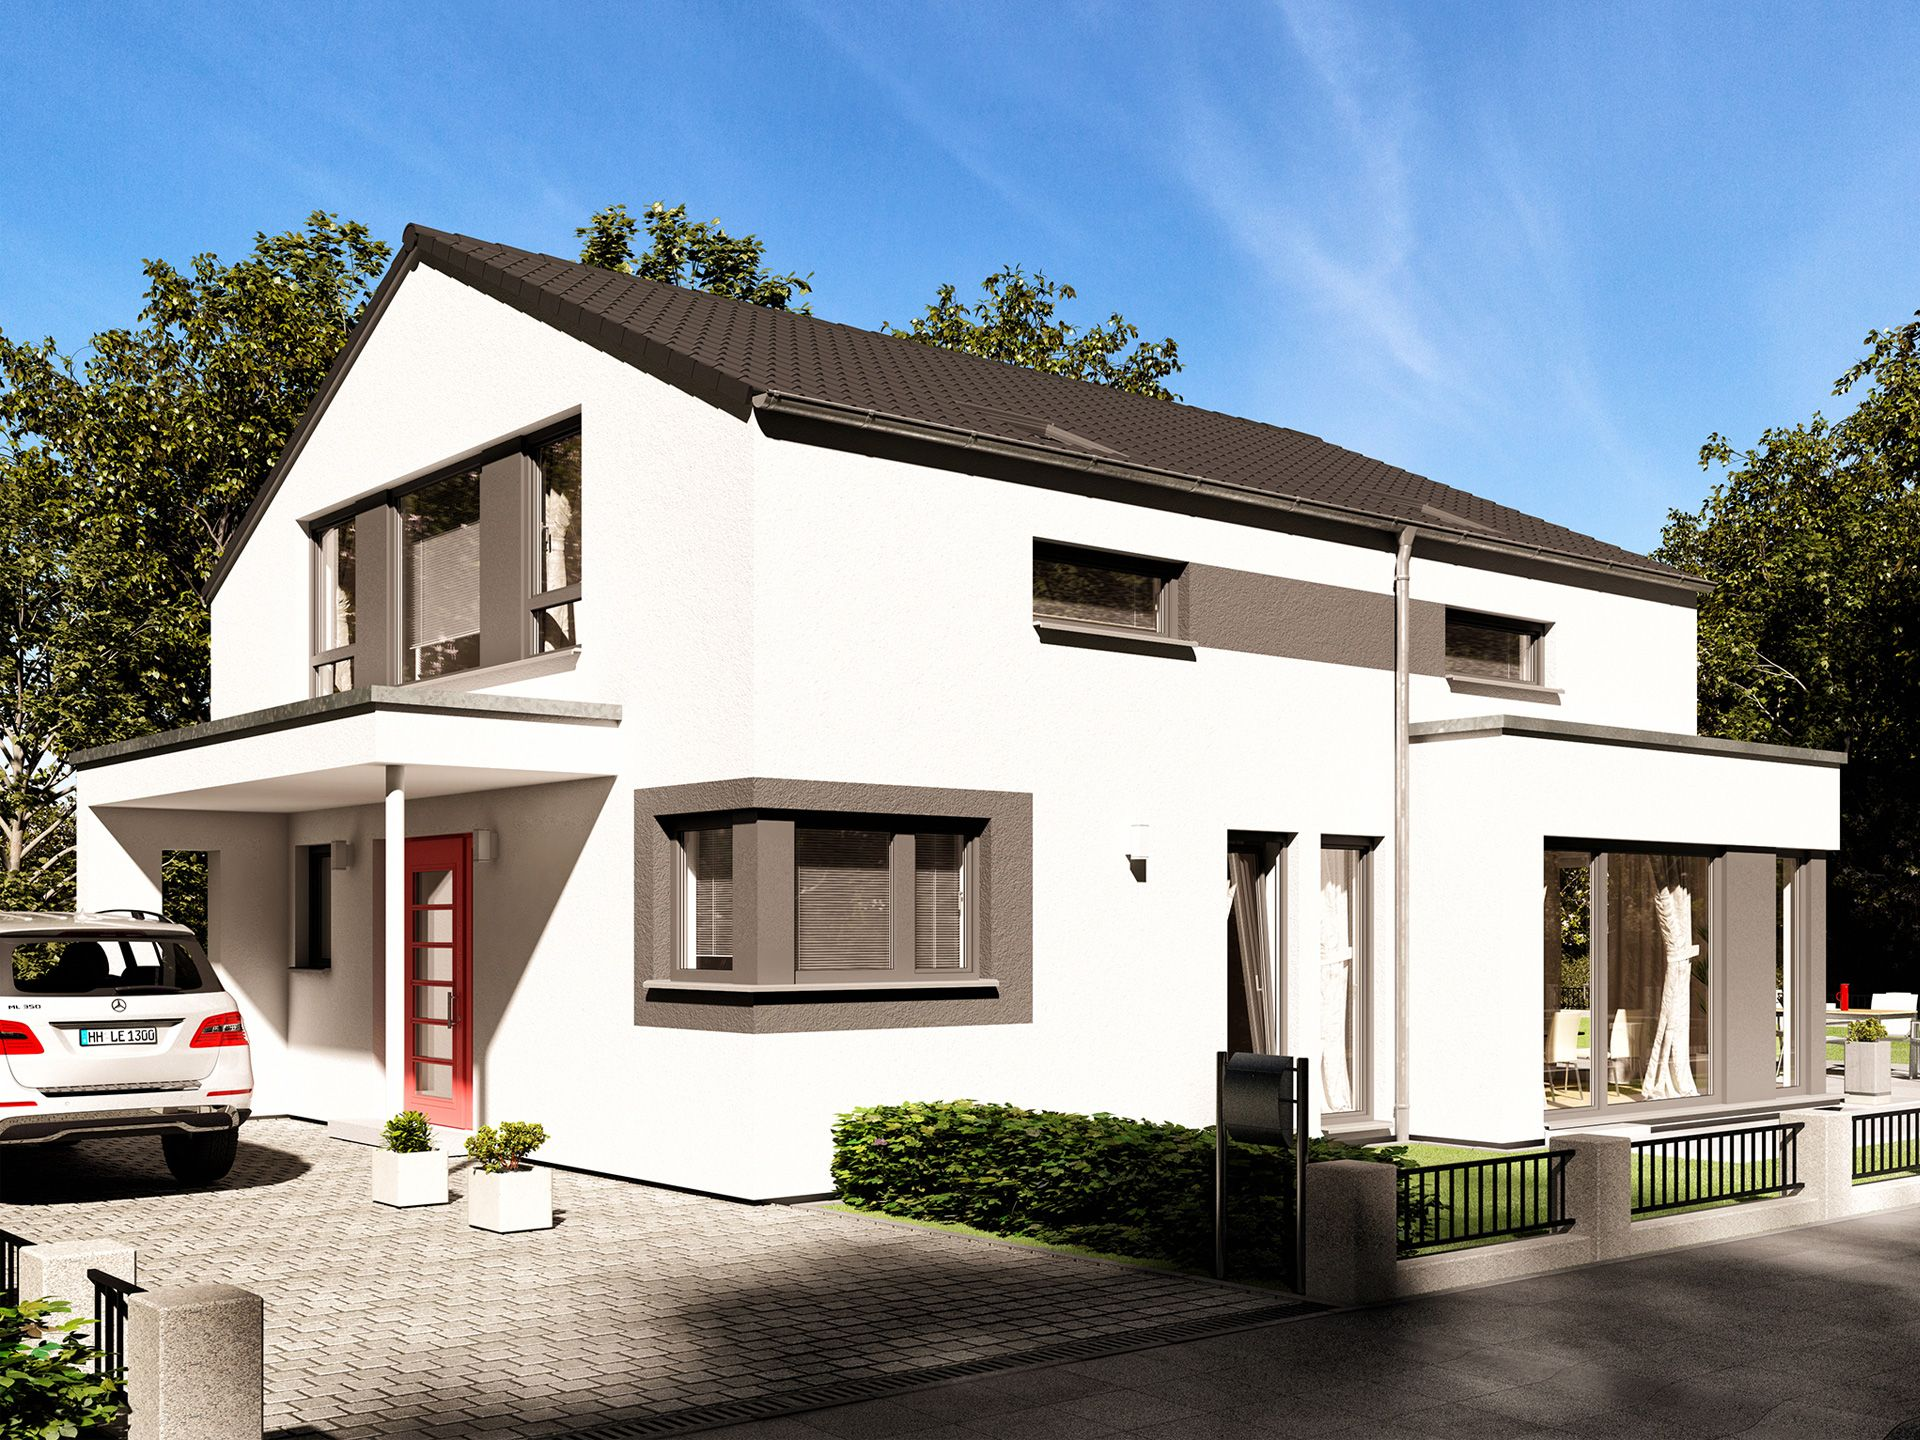 Fertighaus satteldach  Fantastic 162 V4 • Holzhaus von Bien-Zenker • Modernes Fertighaus ...